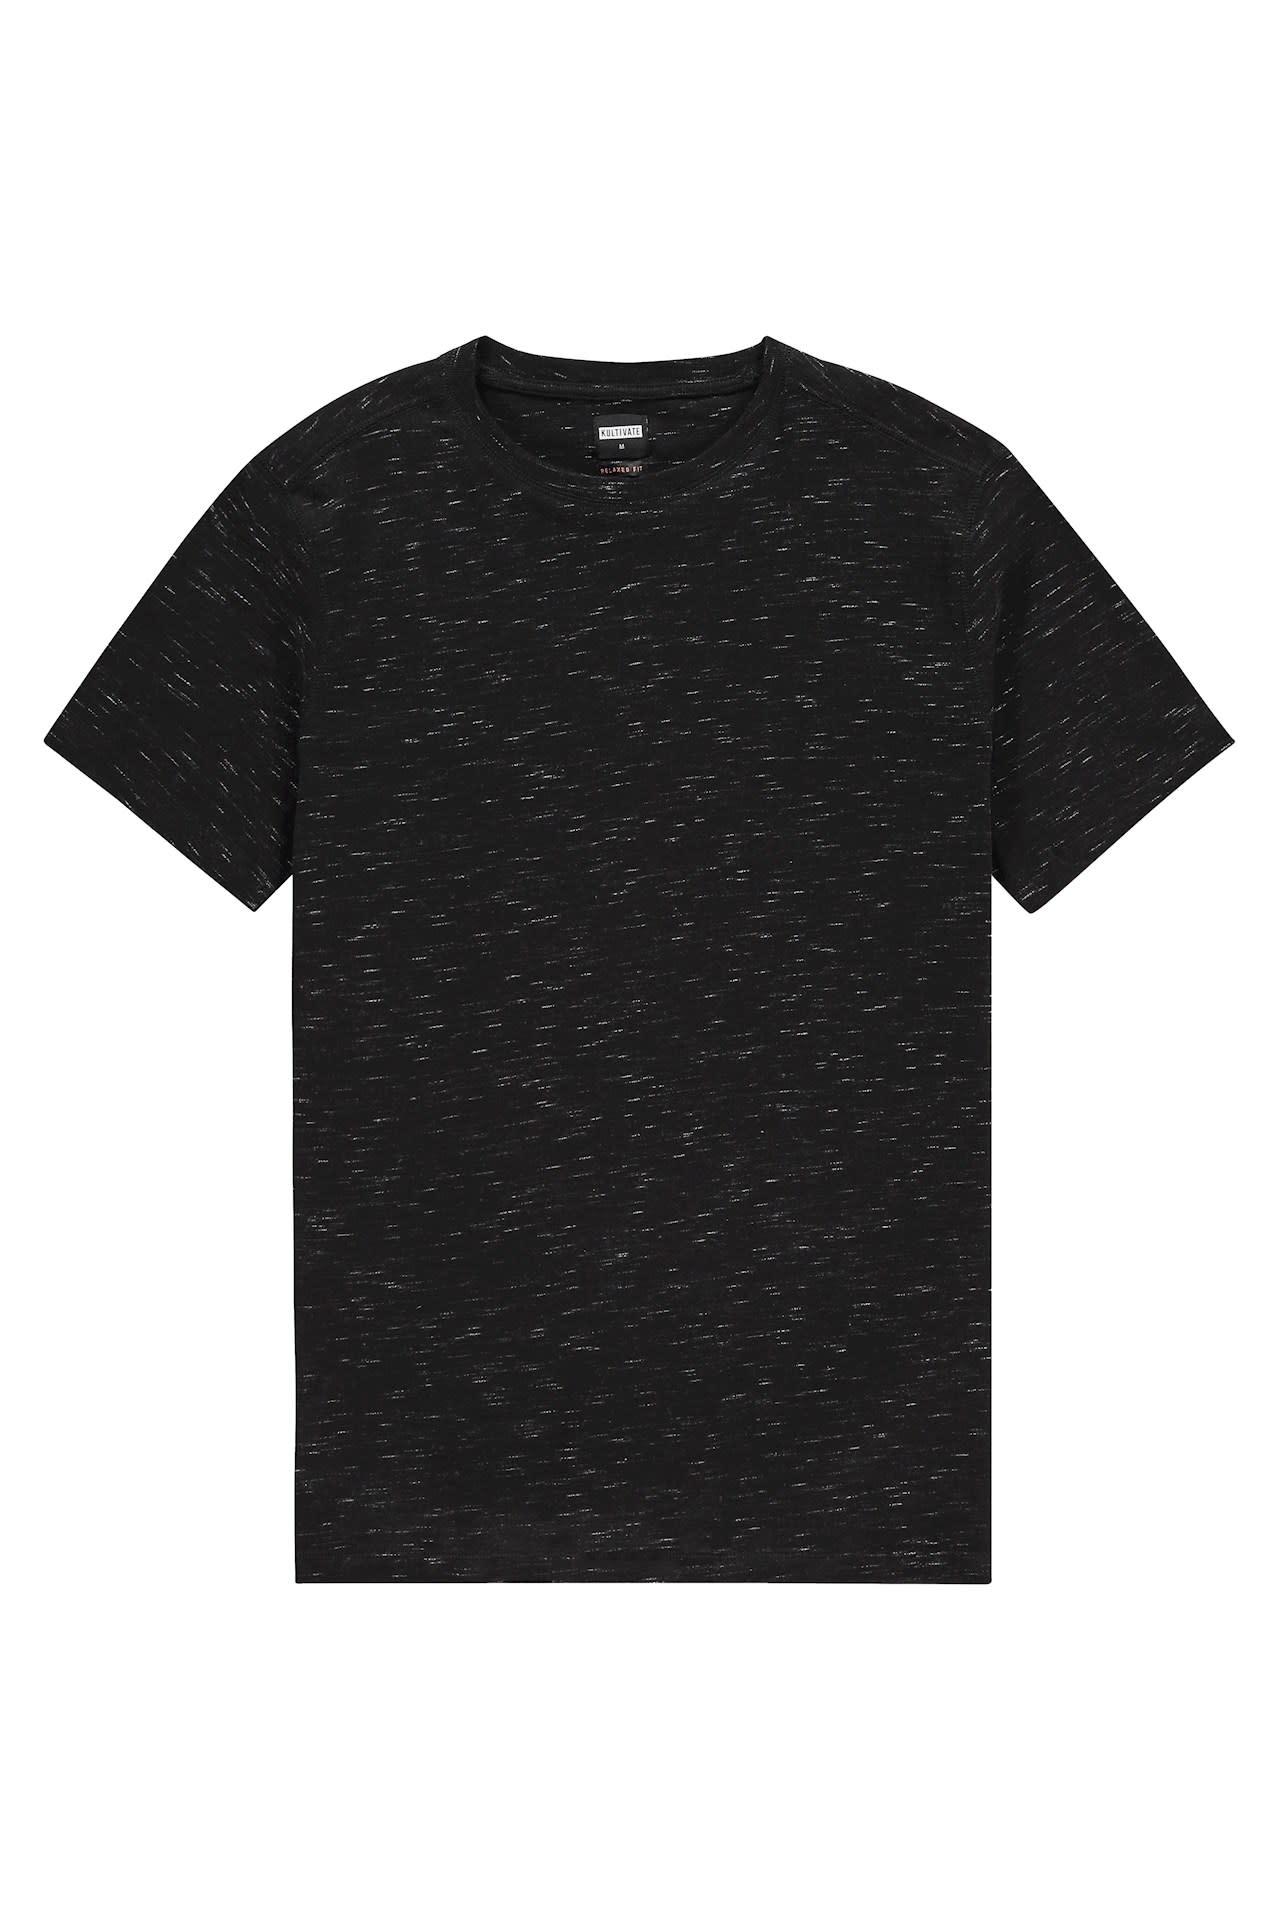 Kultivate Kultivate TS Style Black